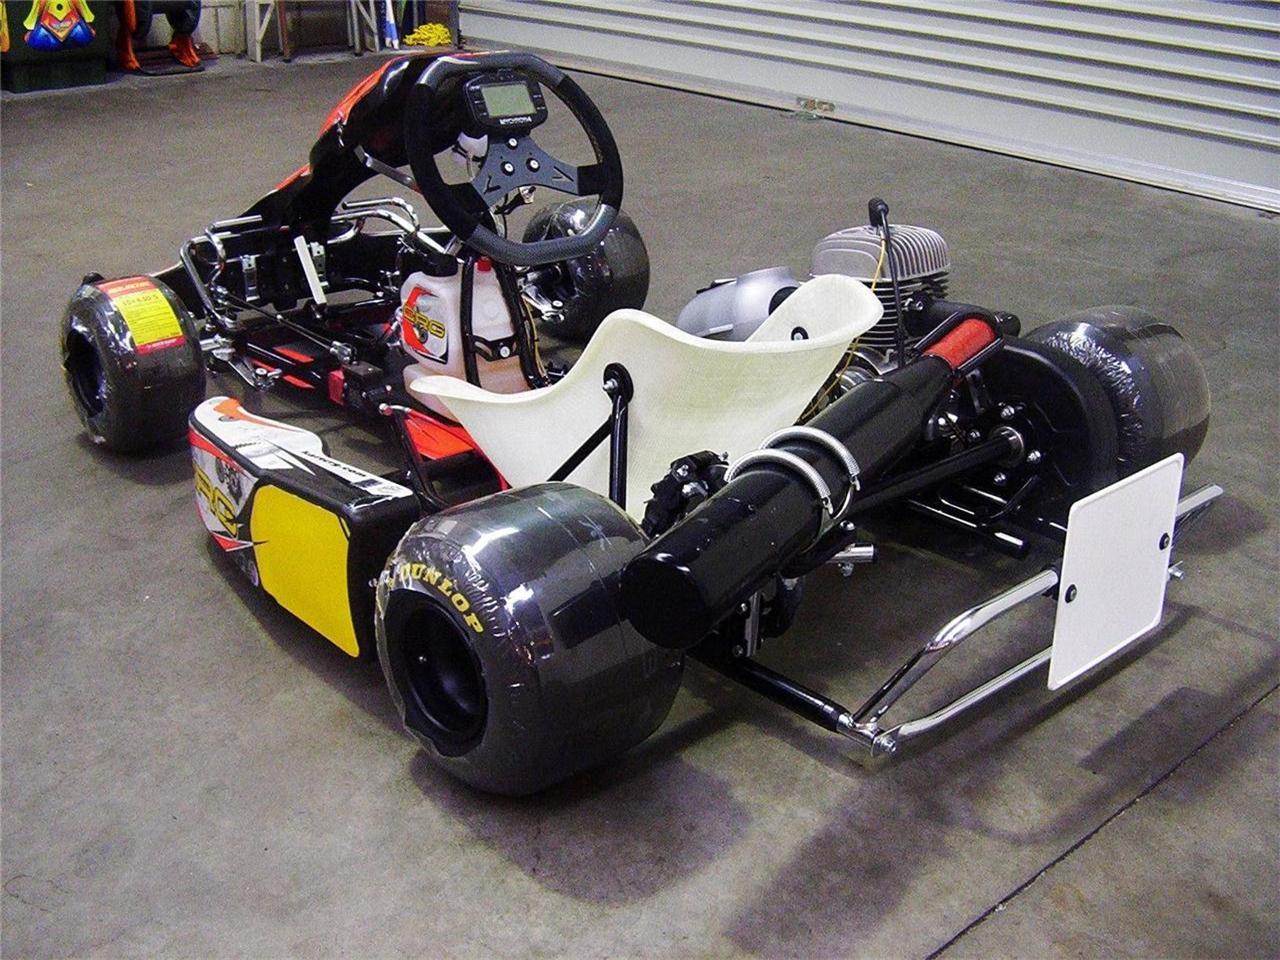 150cc Gy6 Engine Wiring Harness Diagram